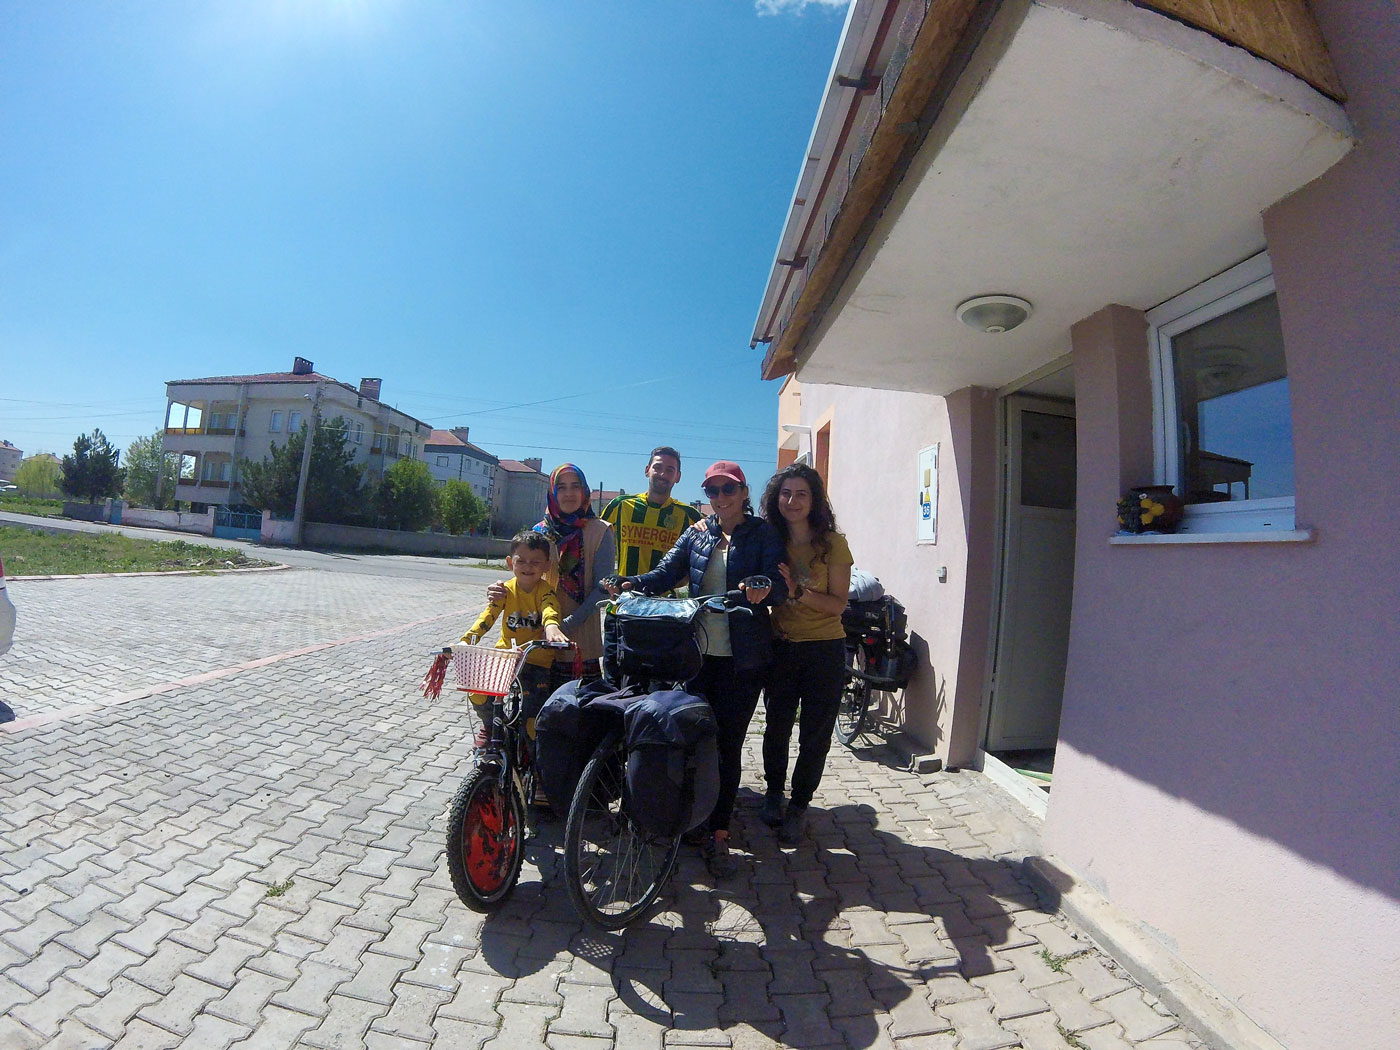 La Turquie à vélo, chez l'ami de Tuğba à Şarkışla. Cycling Turquey, at Tuğba's friend in Şarkışla.